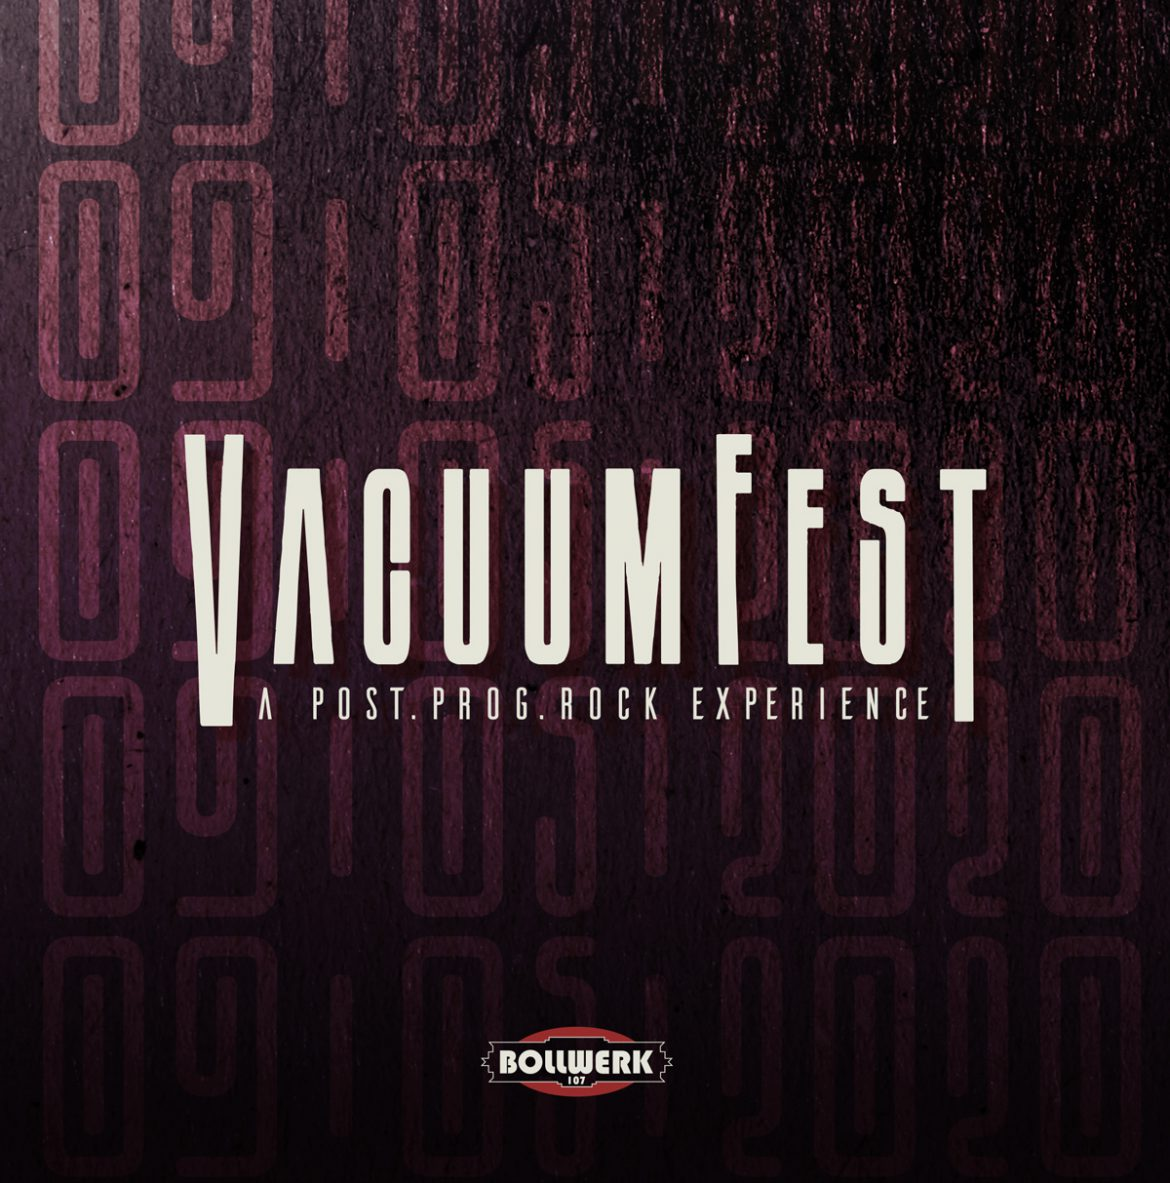 VACUUMFEST_2020_web